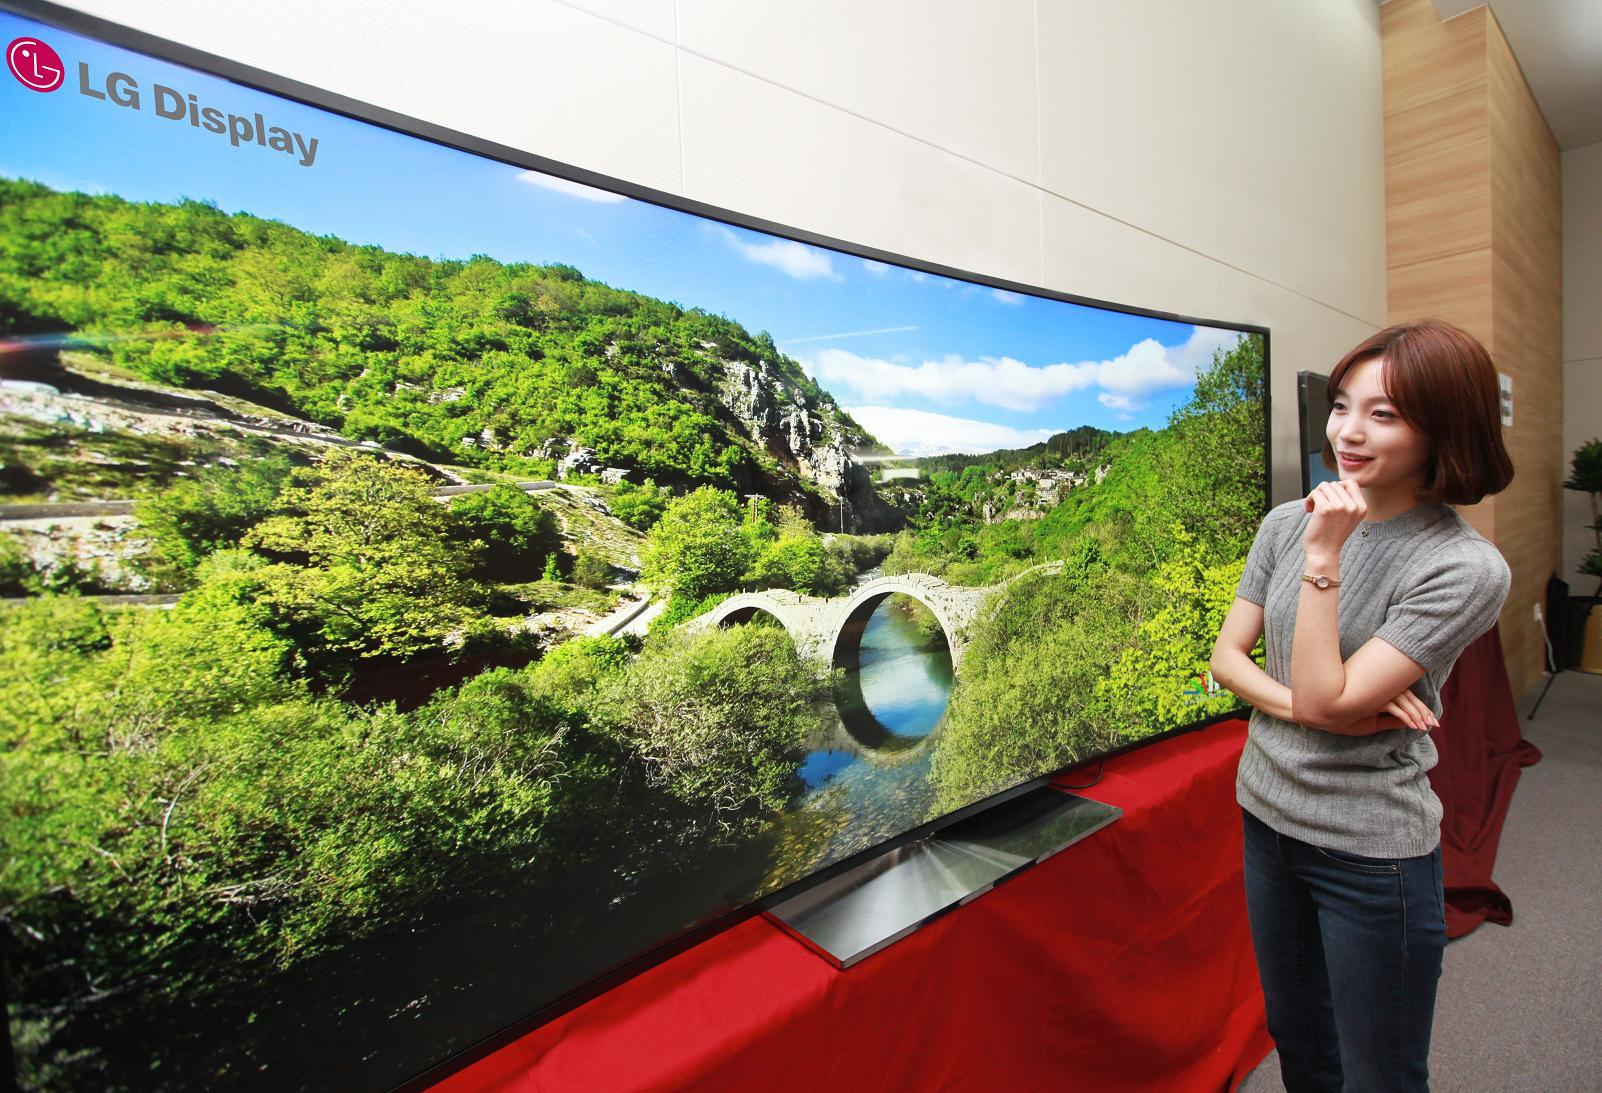 LG Muestra TV 5K De 105 Pulgadas